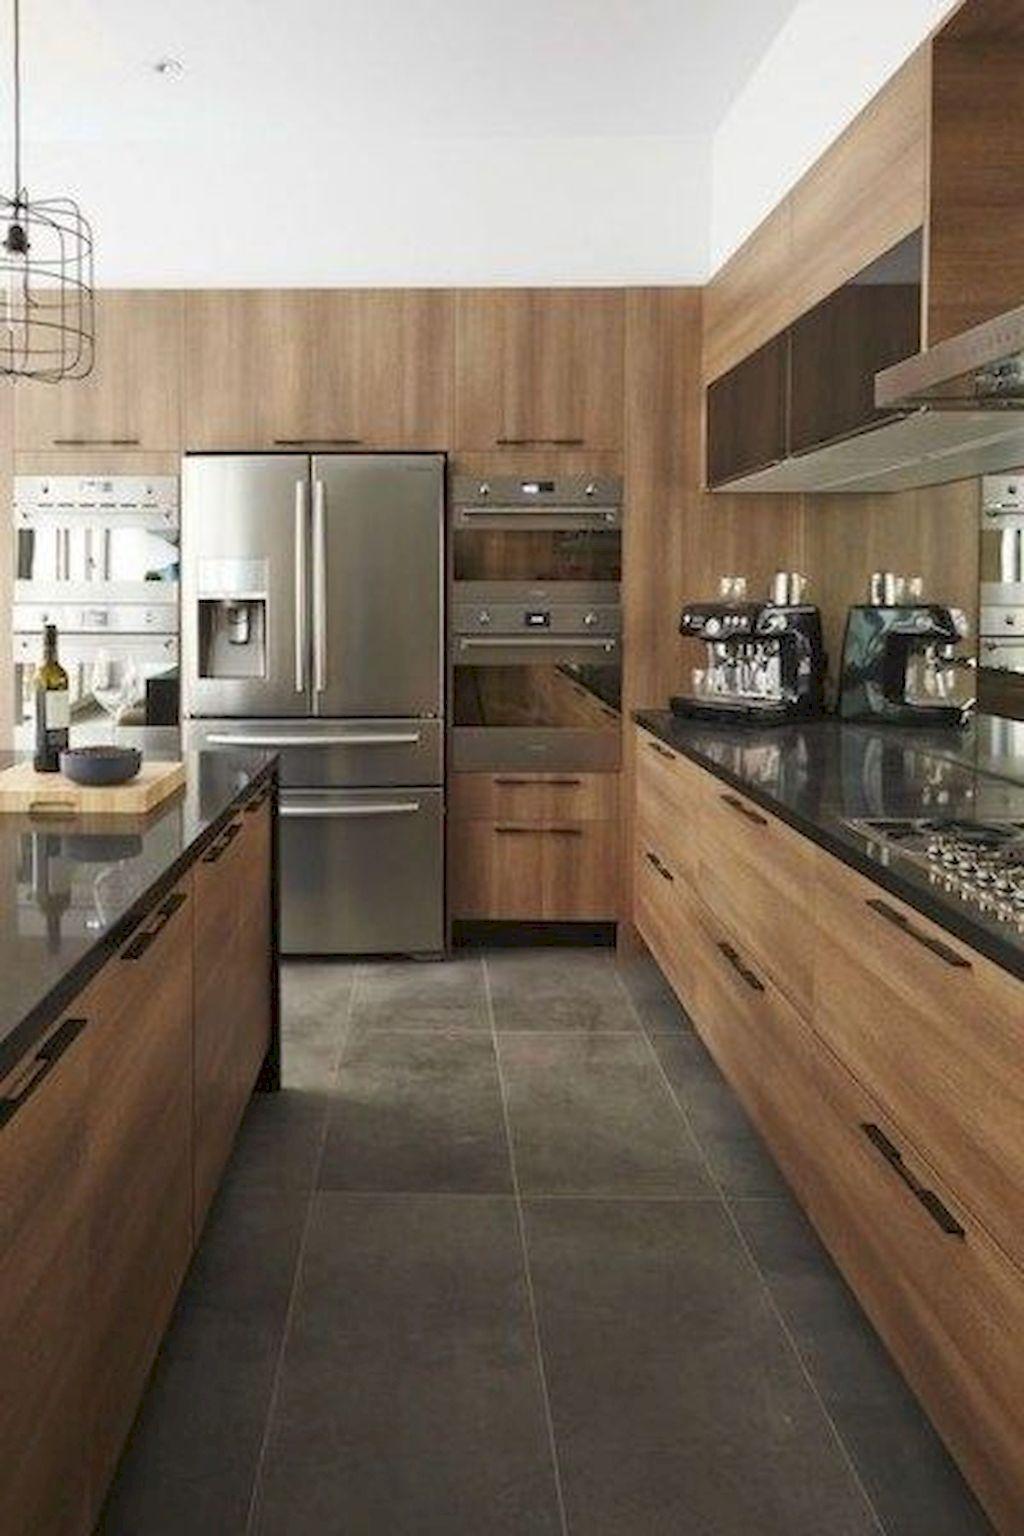 Kitchen Cabinets Designing Style Joecatherine In 2020 Modern Kitchen Design Contemporary Kitchen Design Kitchen Room Design